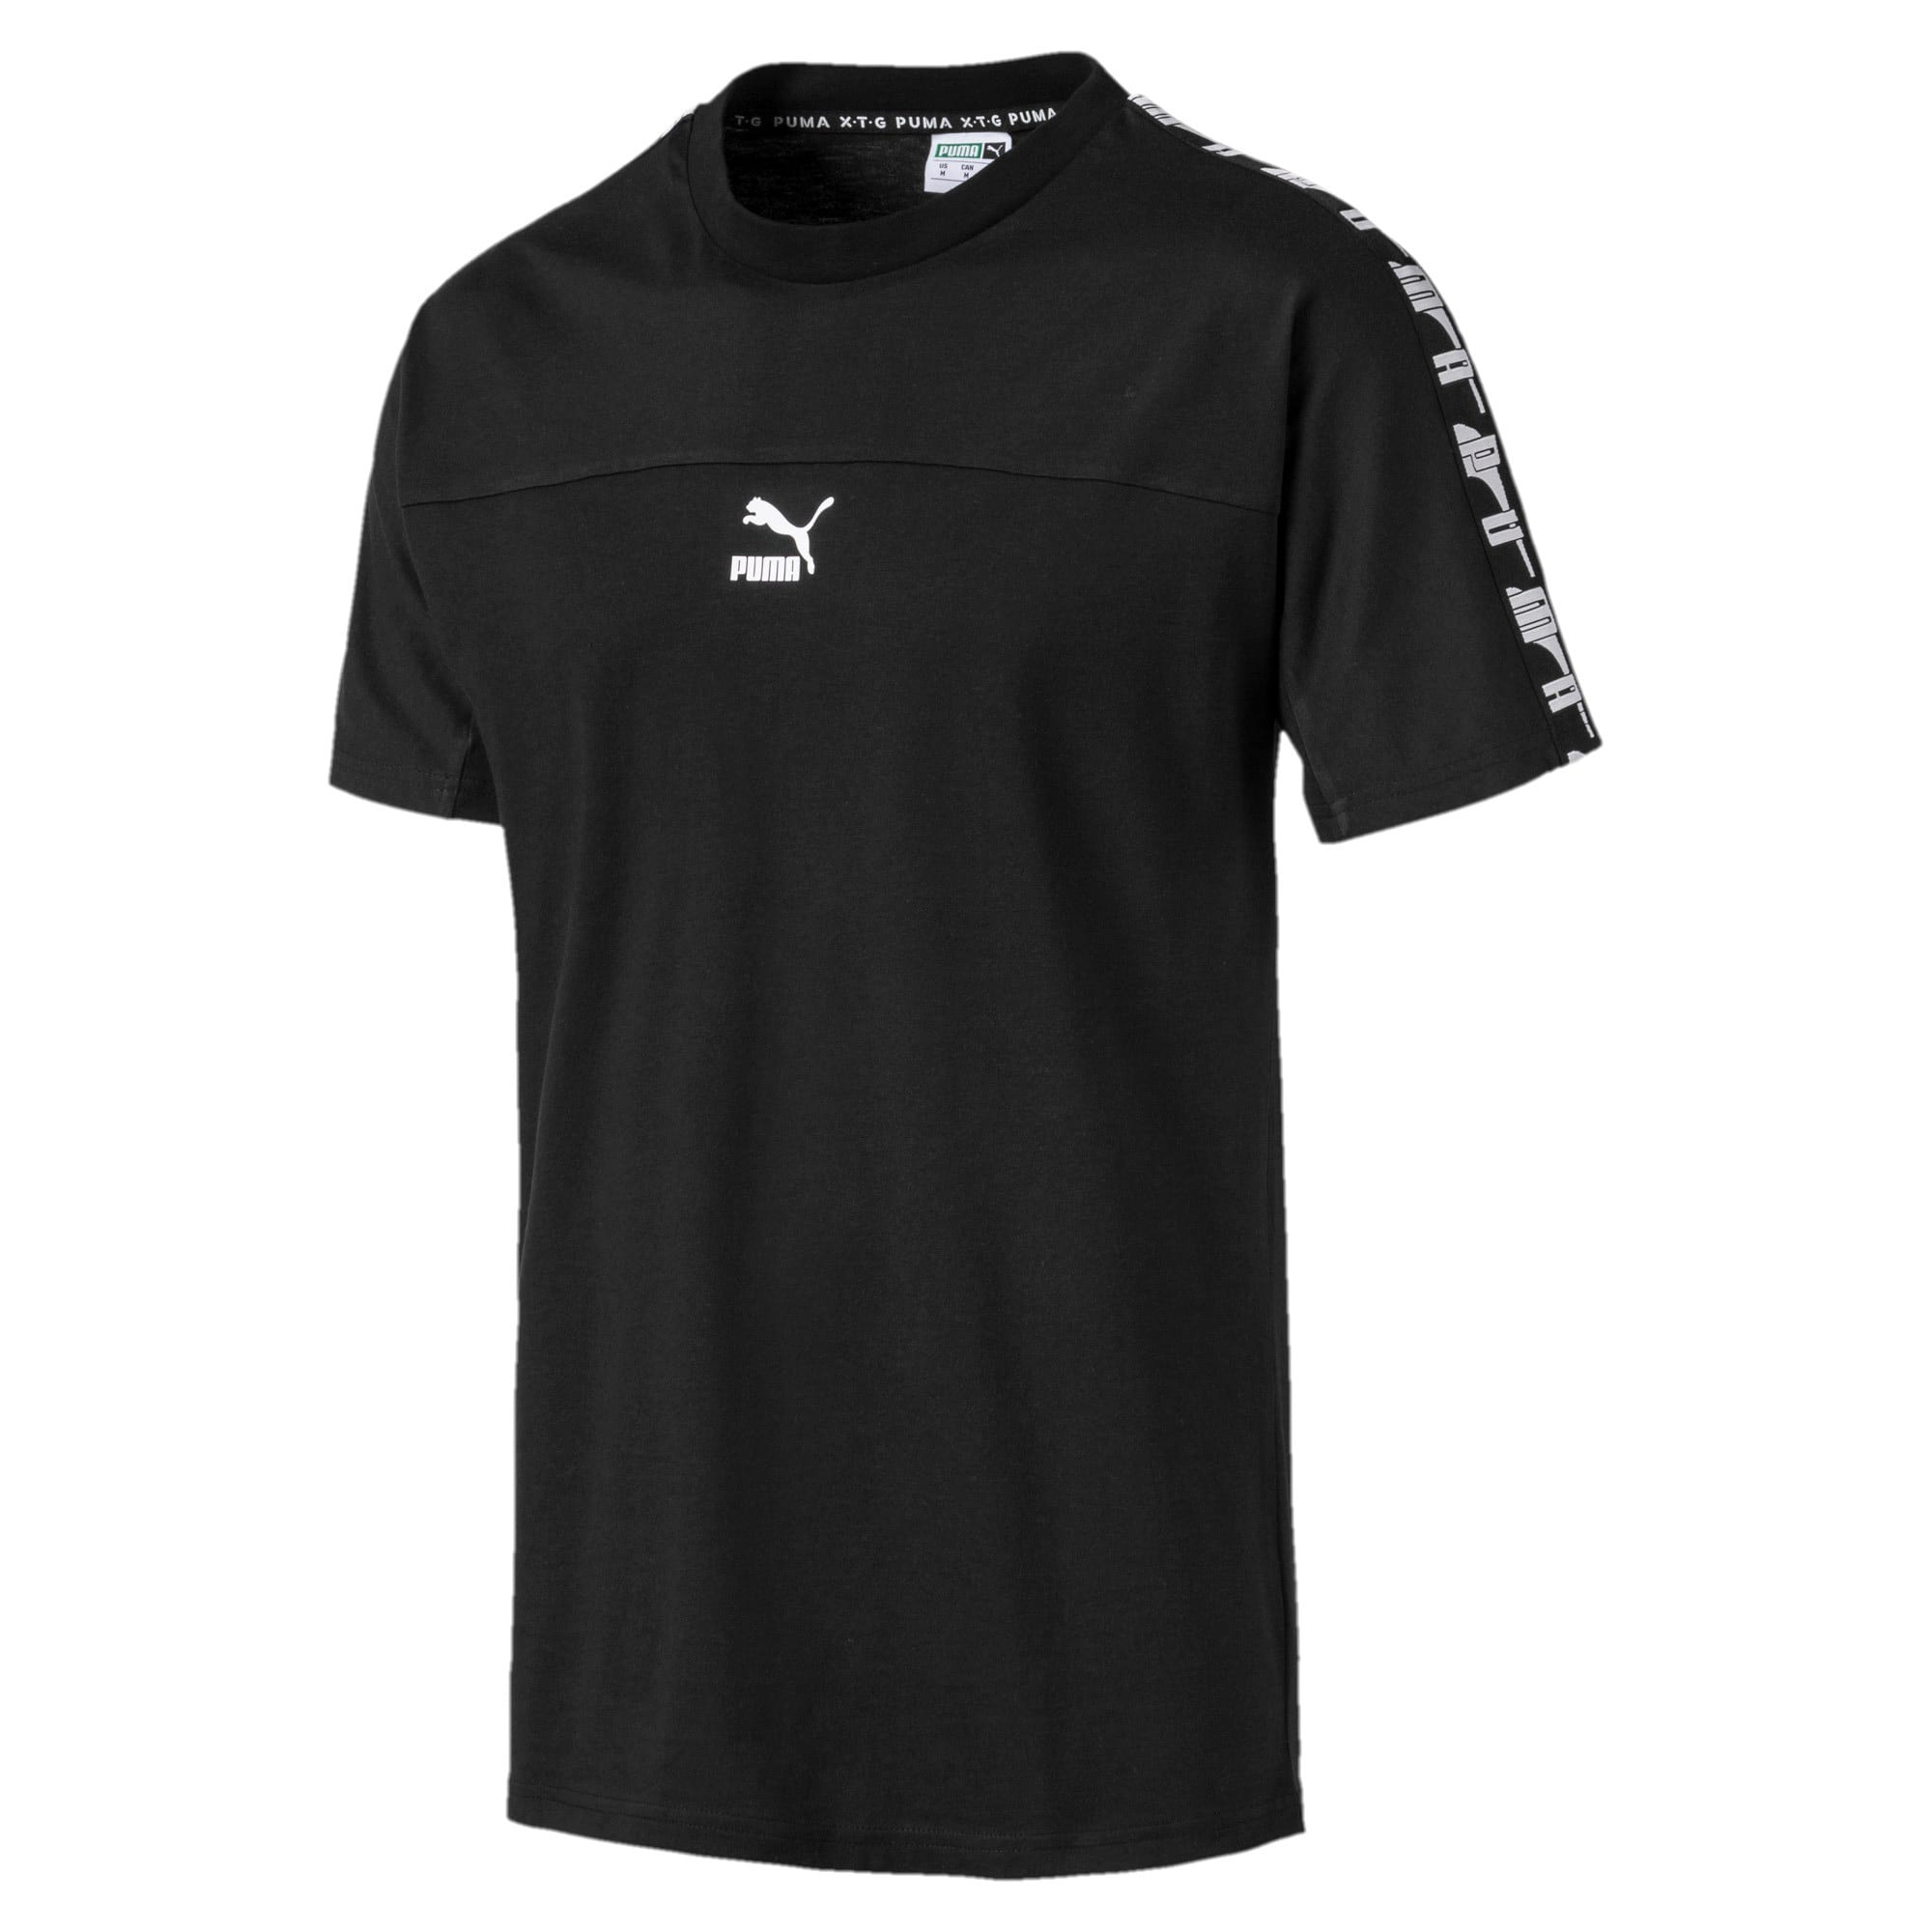 Thumbnail 1 of PUMA XTG SS Tシャツ, Puma Black, medium-JPN